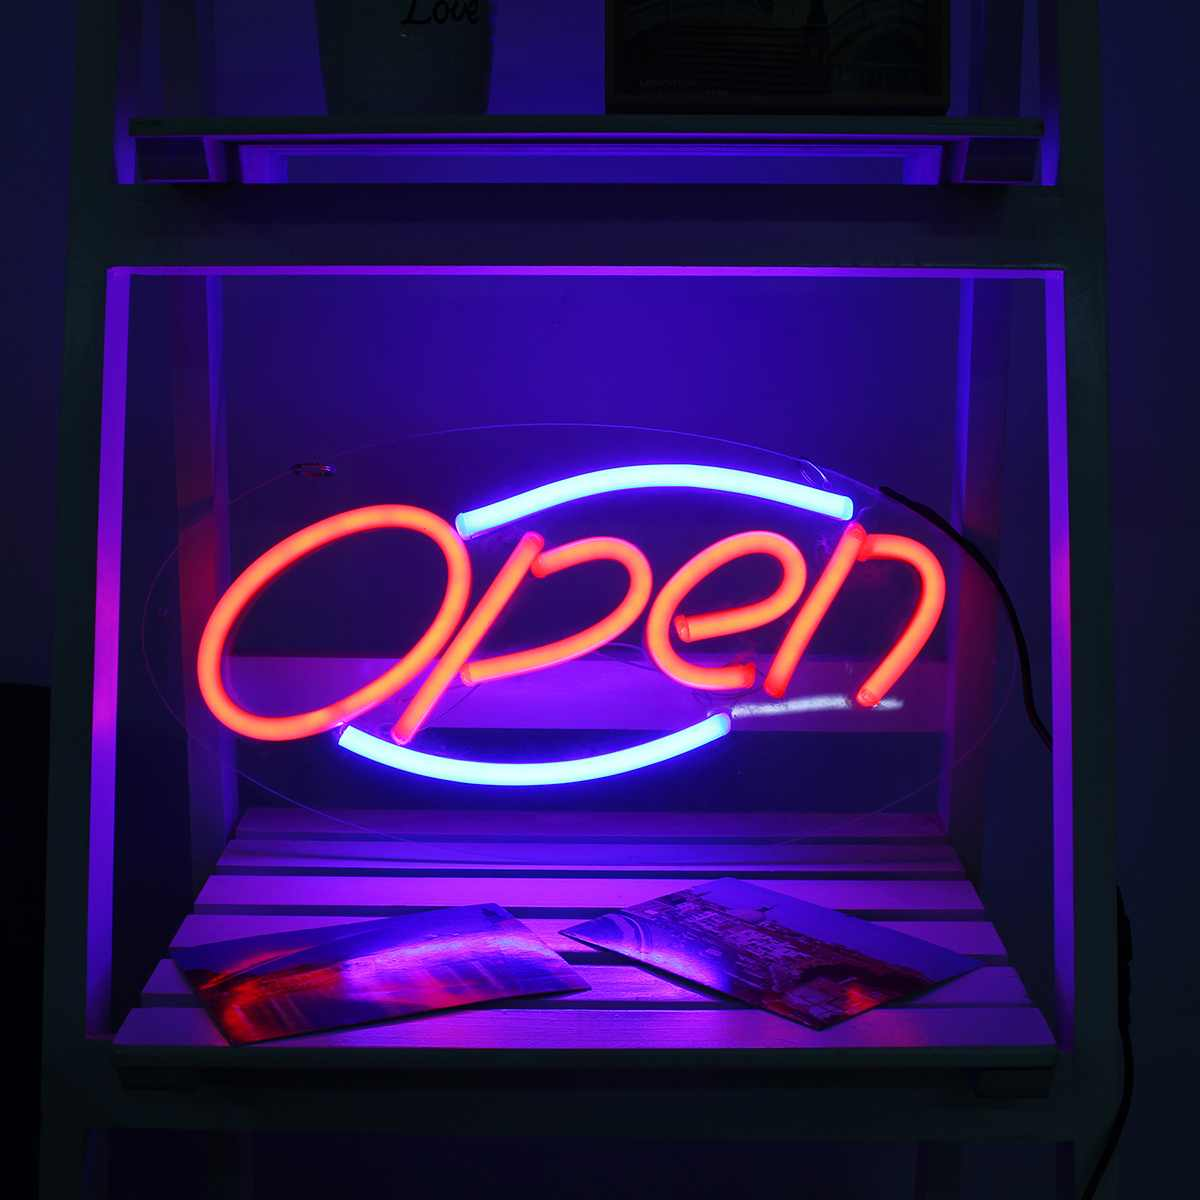 Open Neon Sign Light Bar Pub Club Studio Wall Display LED Neon Tubes Board Visual Artwork Lighting Decoration Night Lamp